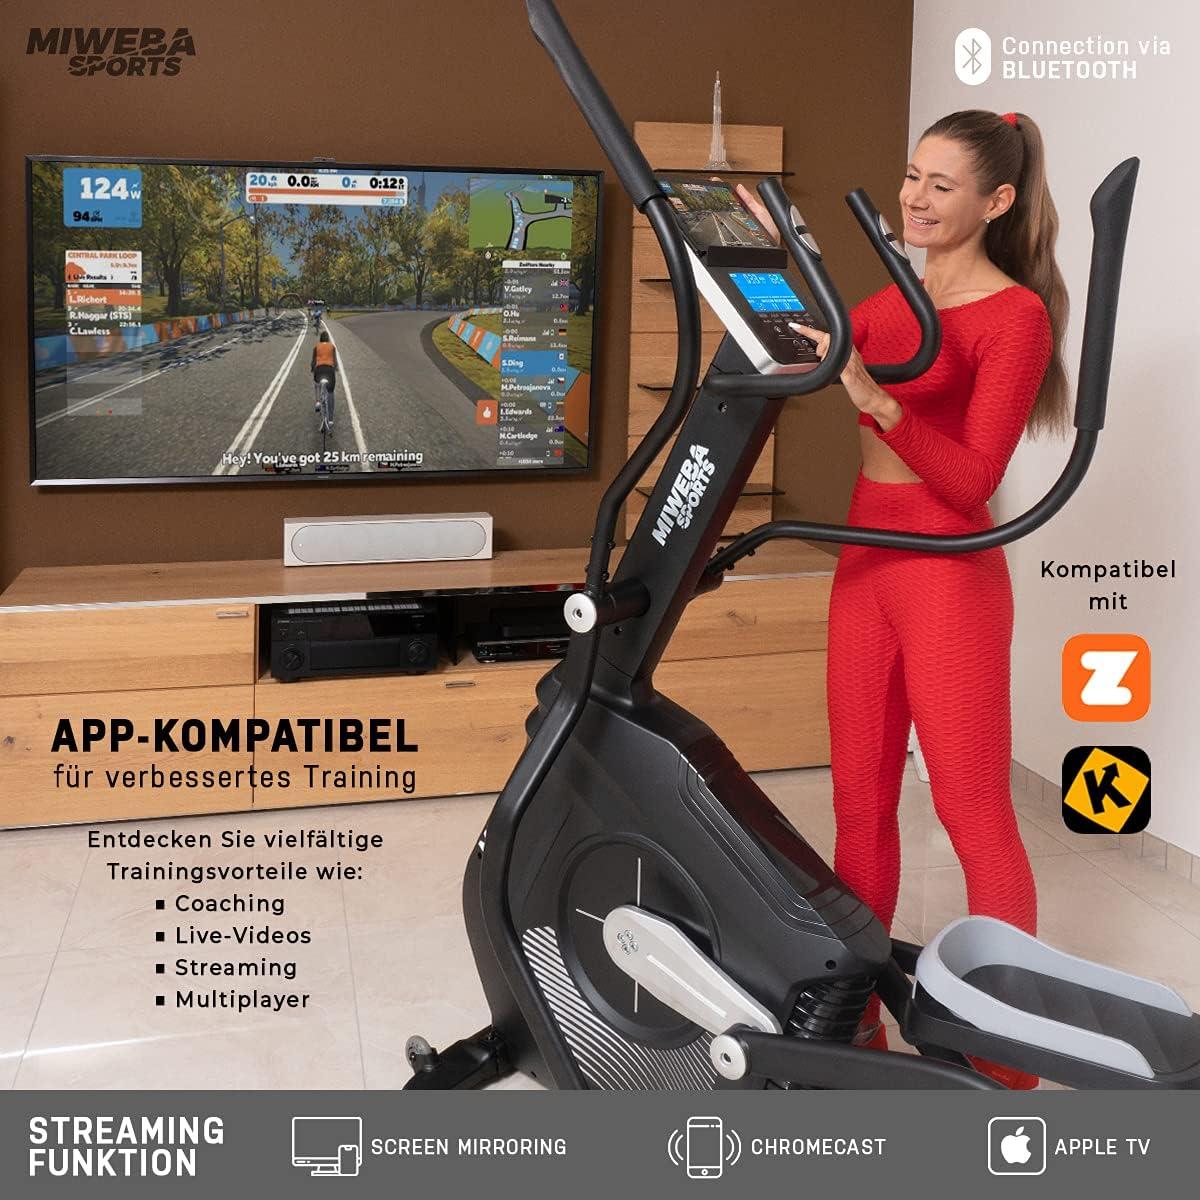 Miweba Sports Crosstrainer MC700 - App-Konnektivität